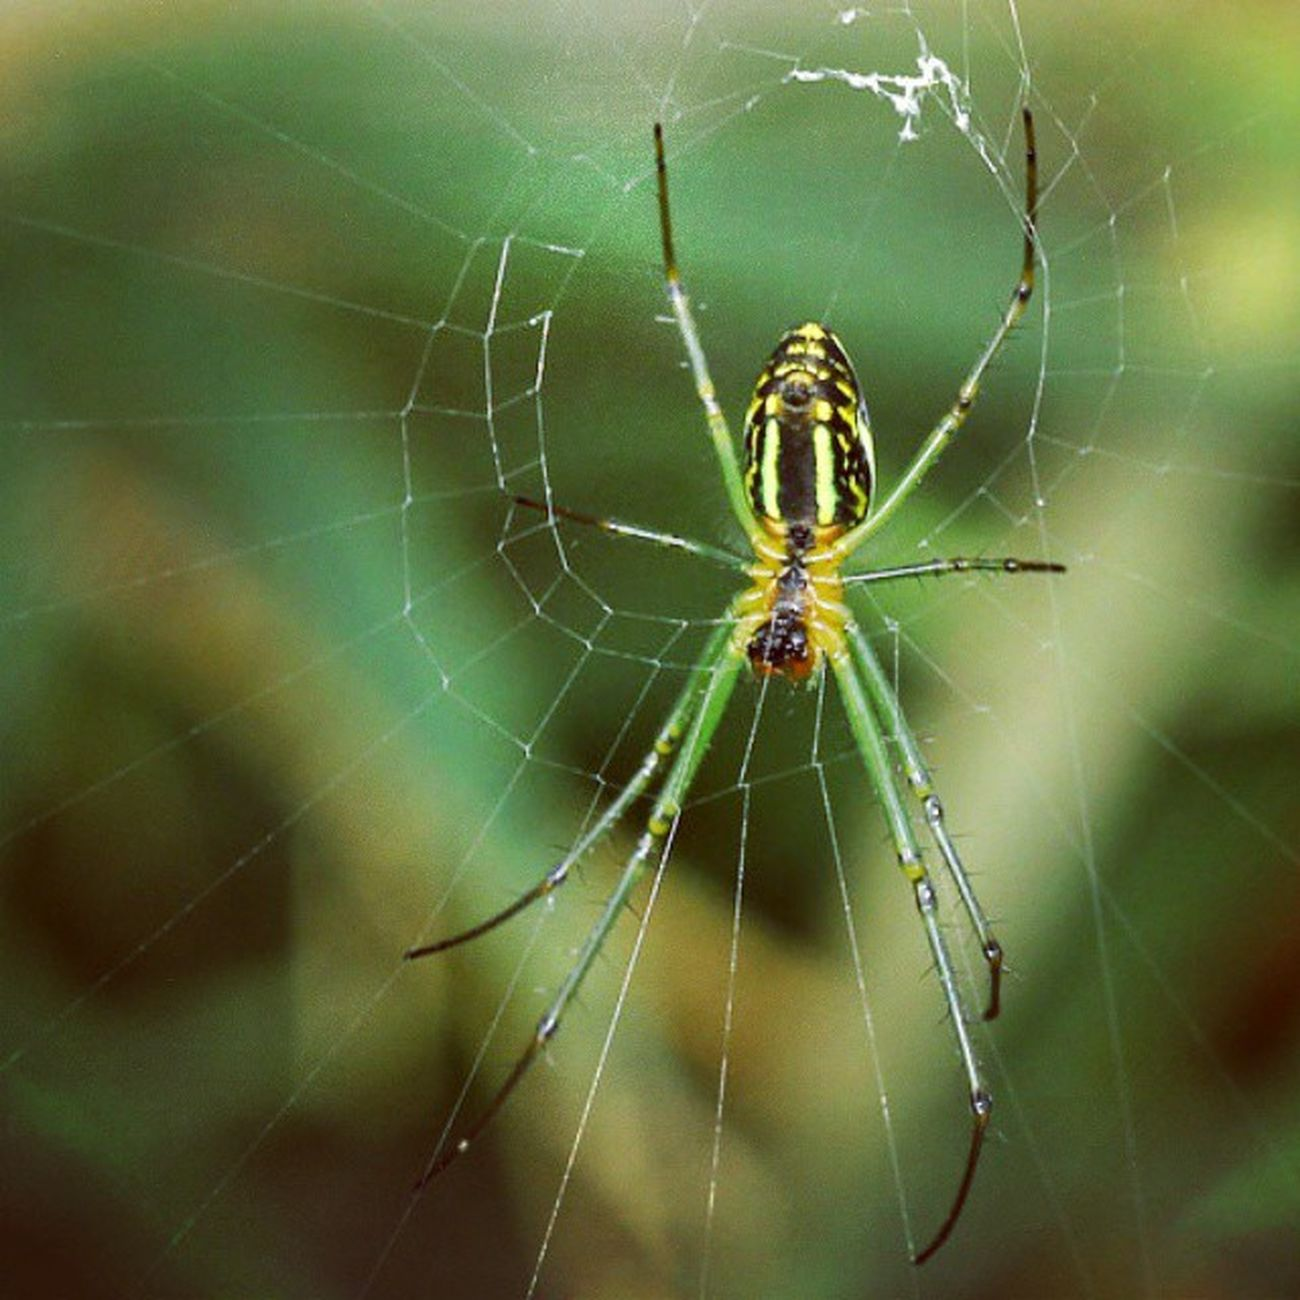 Ig_spiders Ig_spider Spider spiderworld nature green macro closeup top_macro macroworld_tr macroworld_ macro_secrets